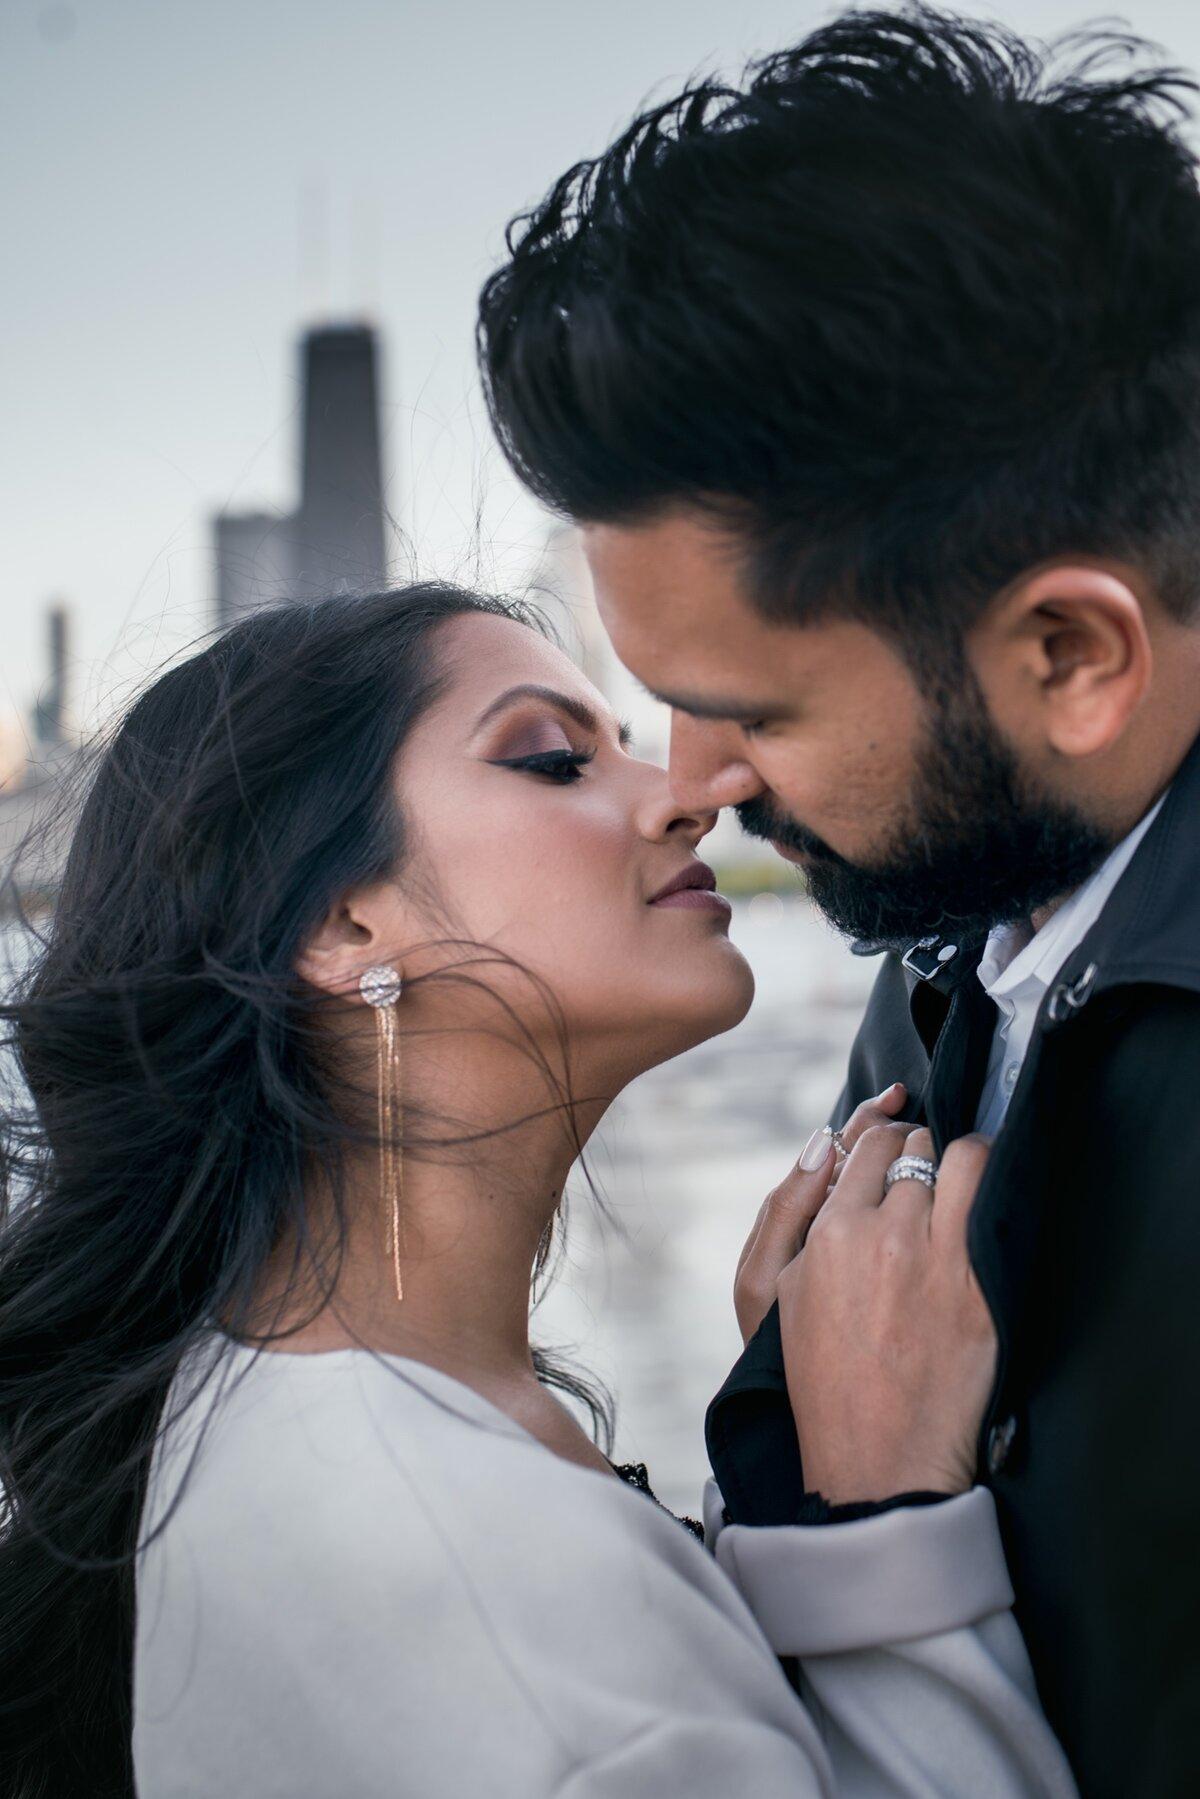 Le Cape Weddings - Chicago Engagement Session - Joann and Bensen -21.jpg